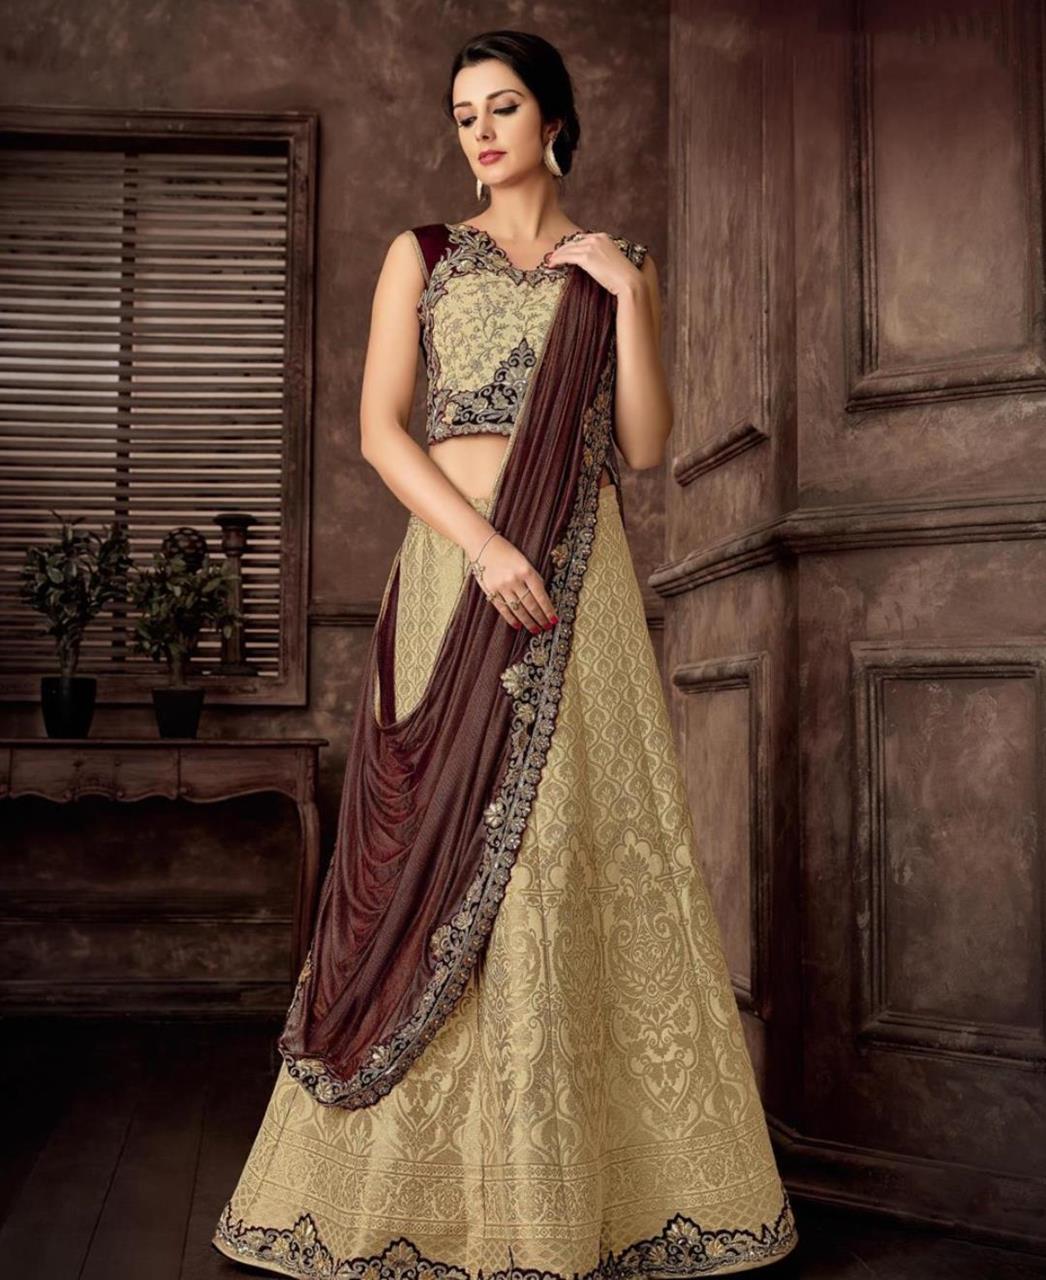 Cord Work Jacquard Saree(Sari) in Cream